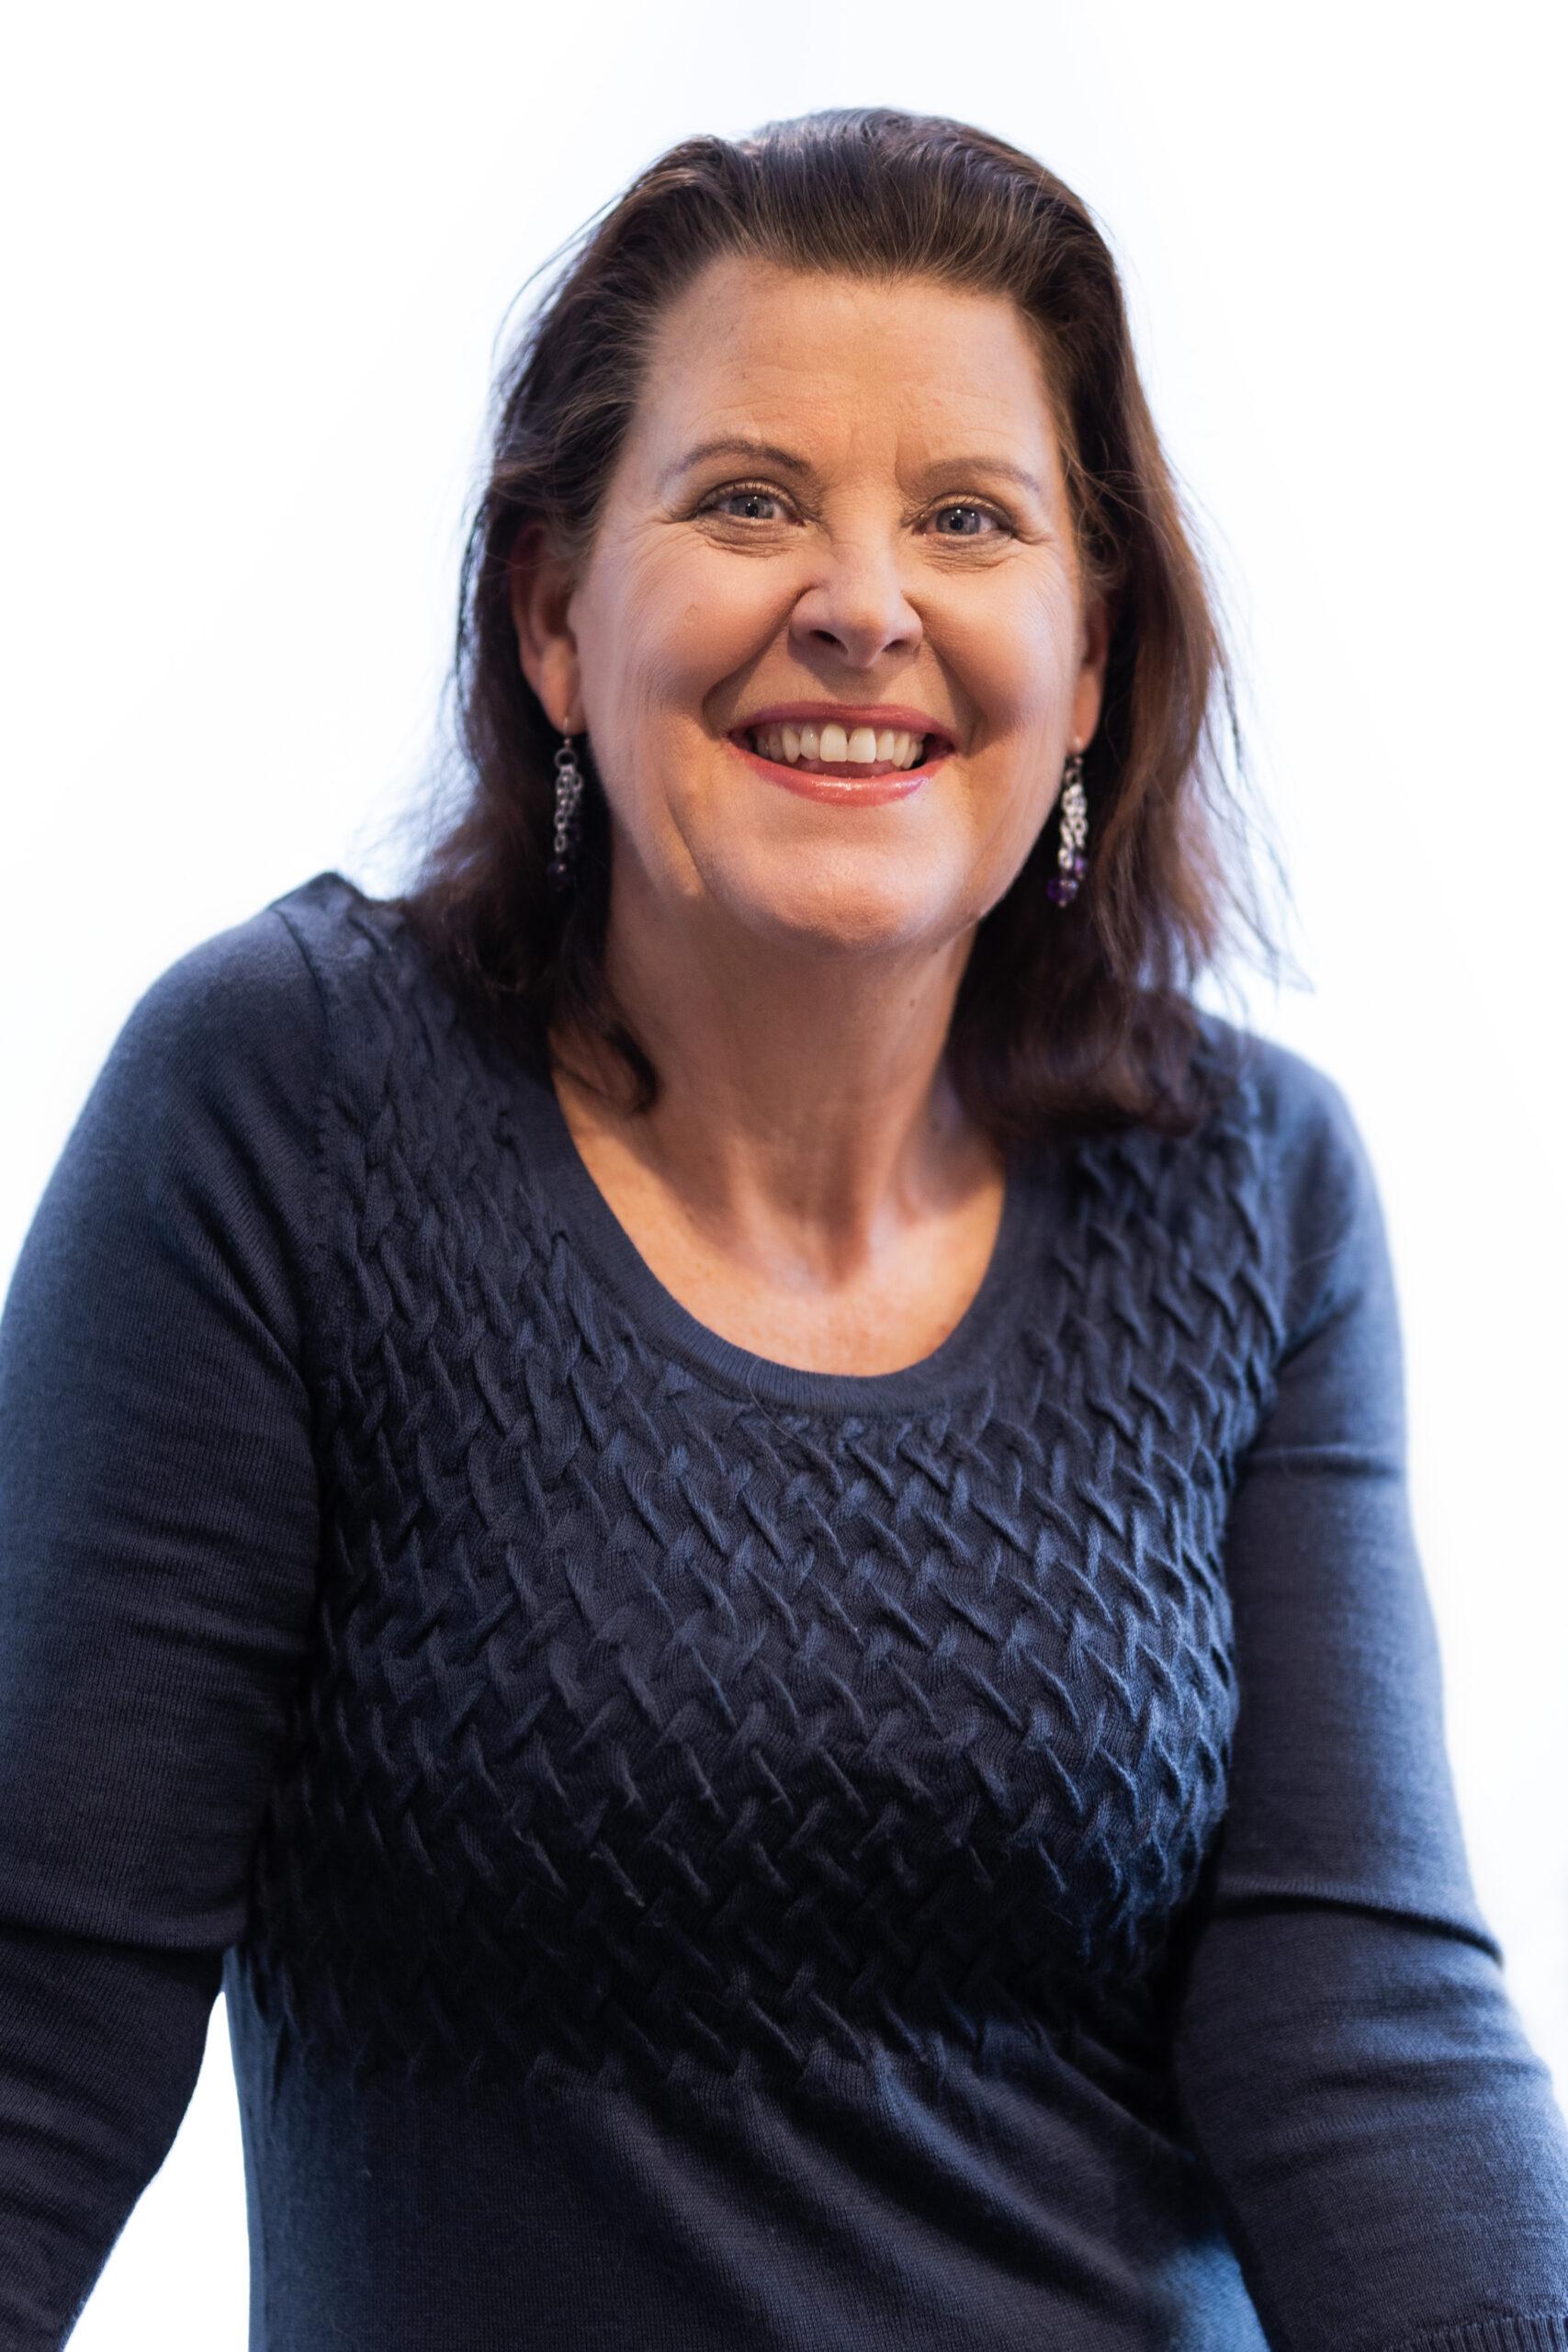 Beryl Hedger Owner, Mentor, Business Coach